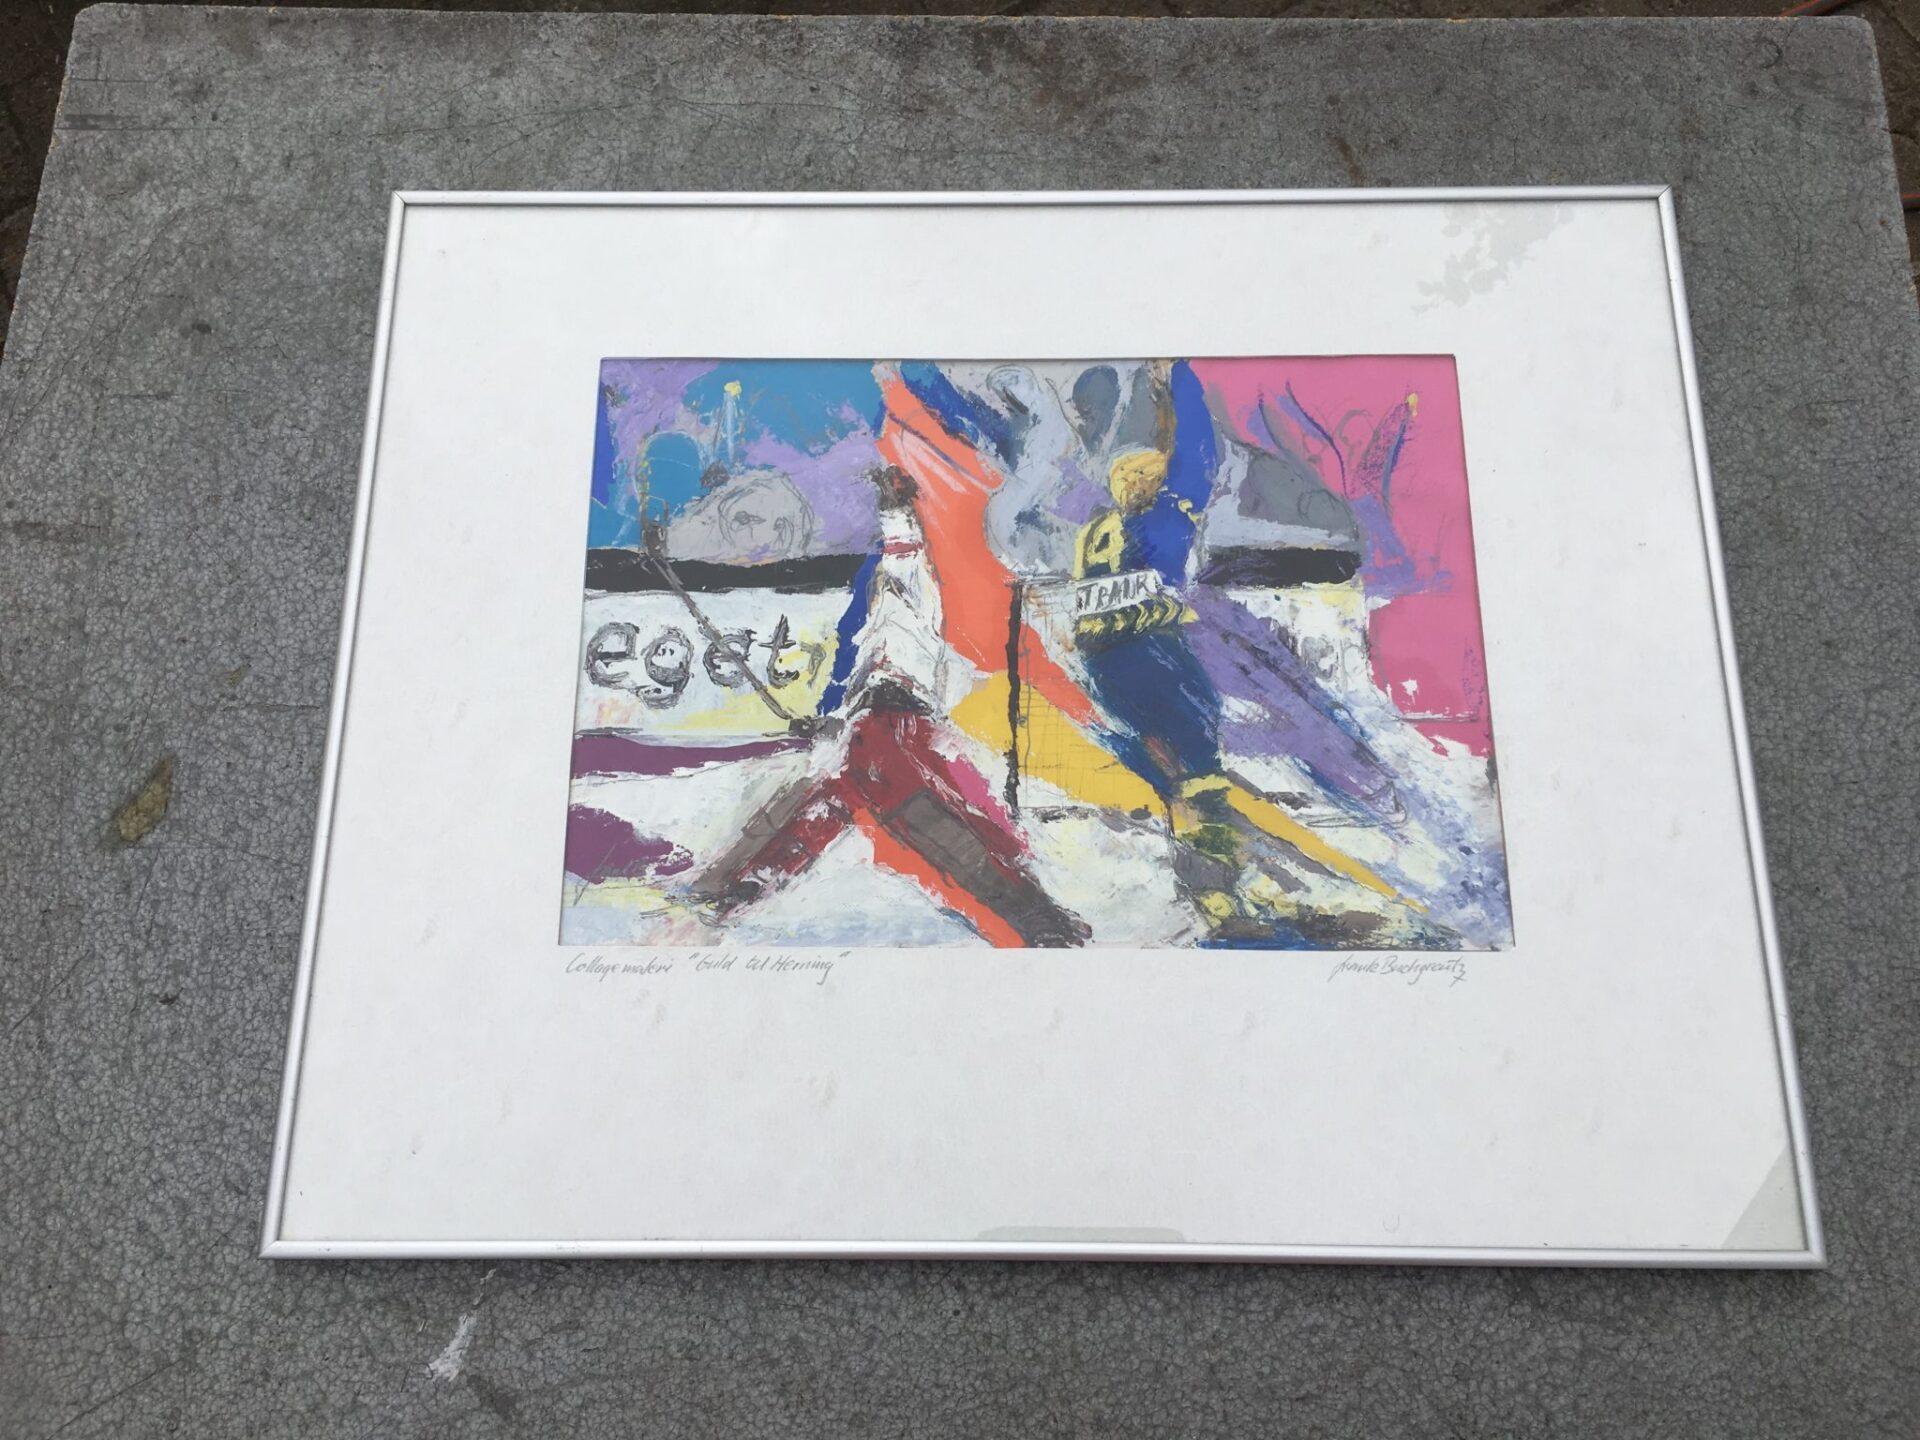 Frank Buchgraitz, collage maleri, 500 kr